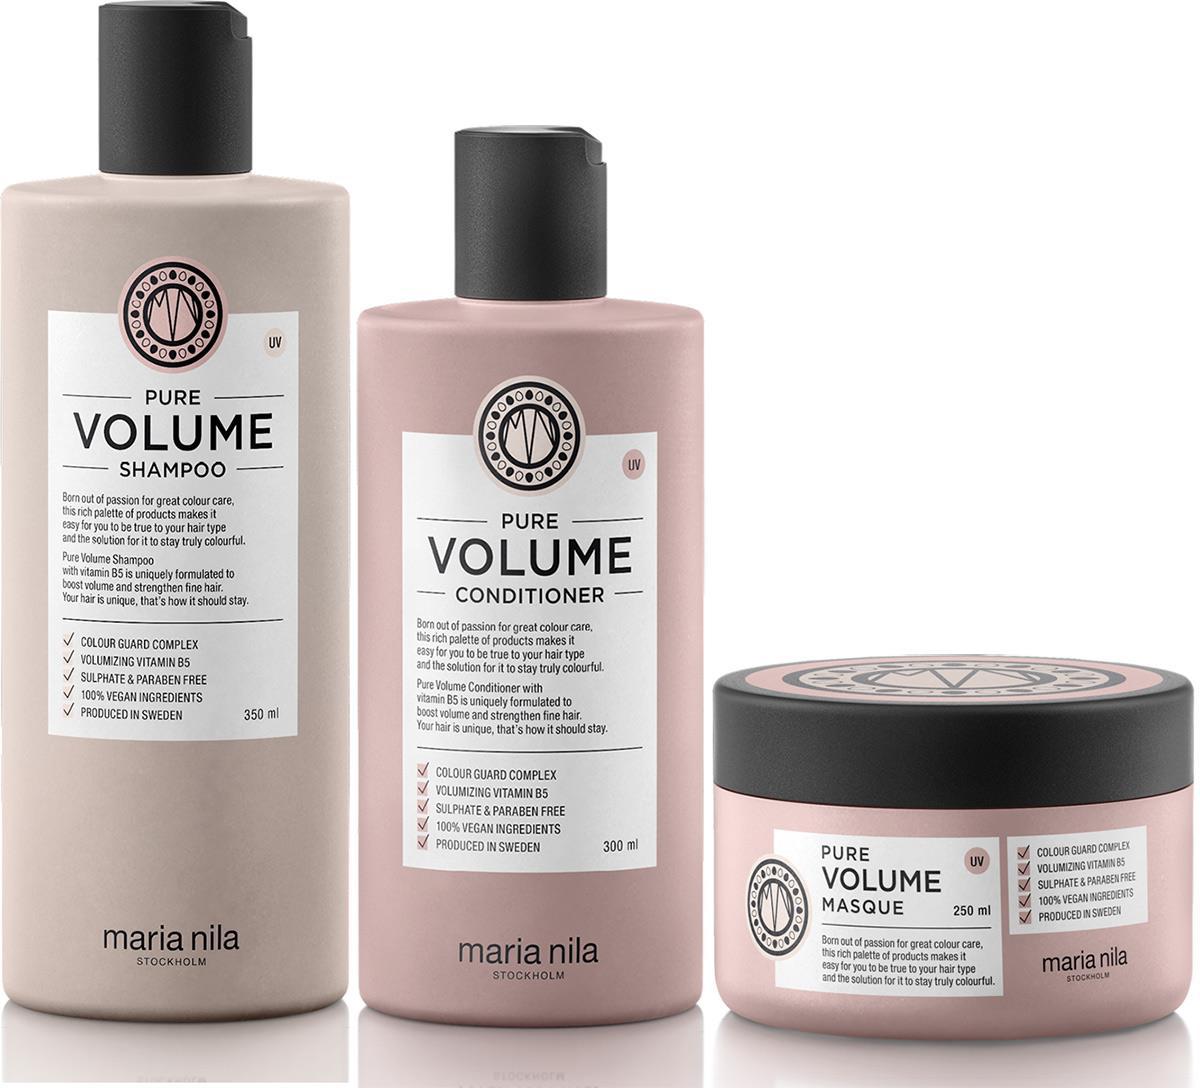 maria nila palett pure volume trio 1003 918 0900 1